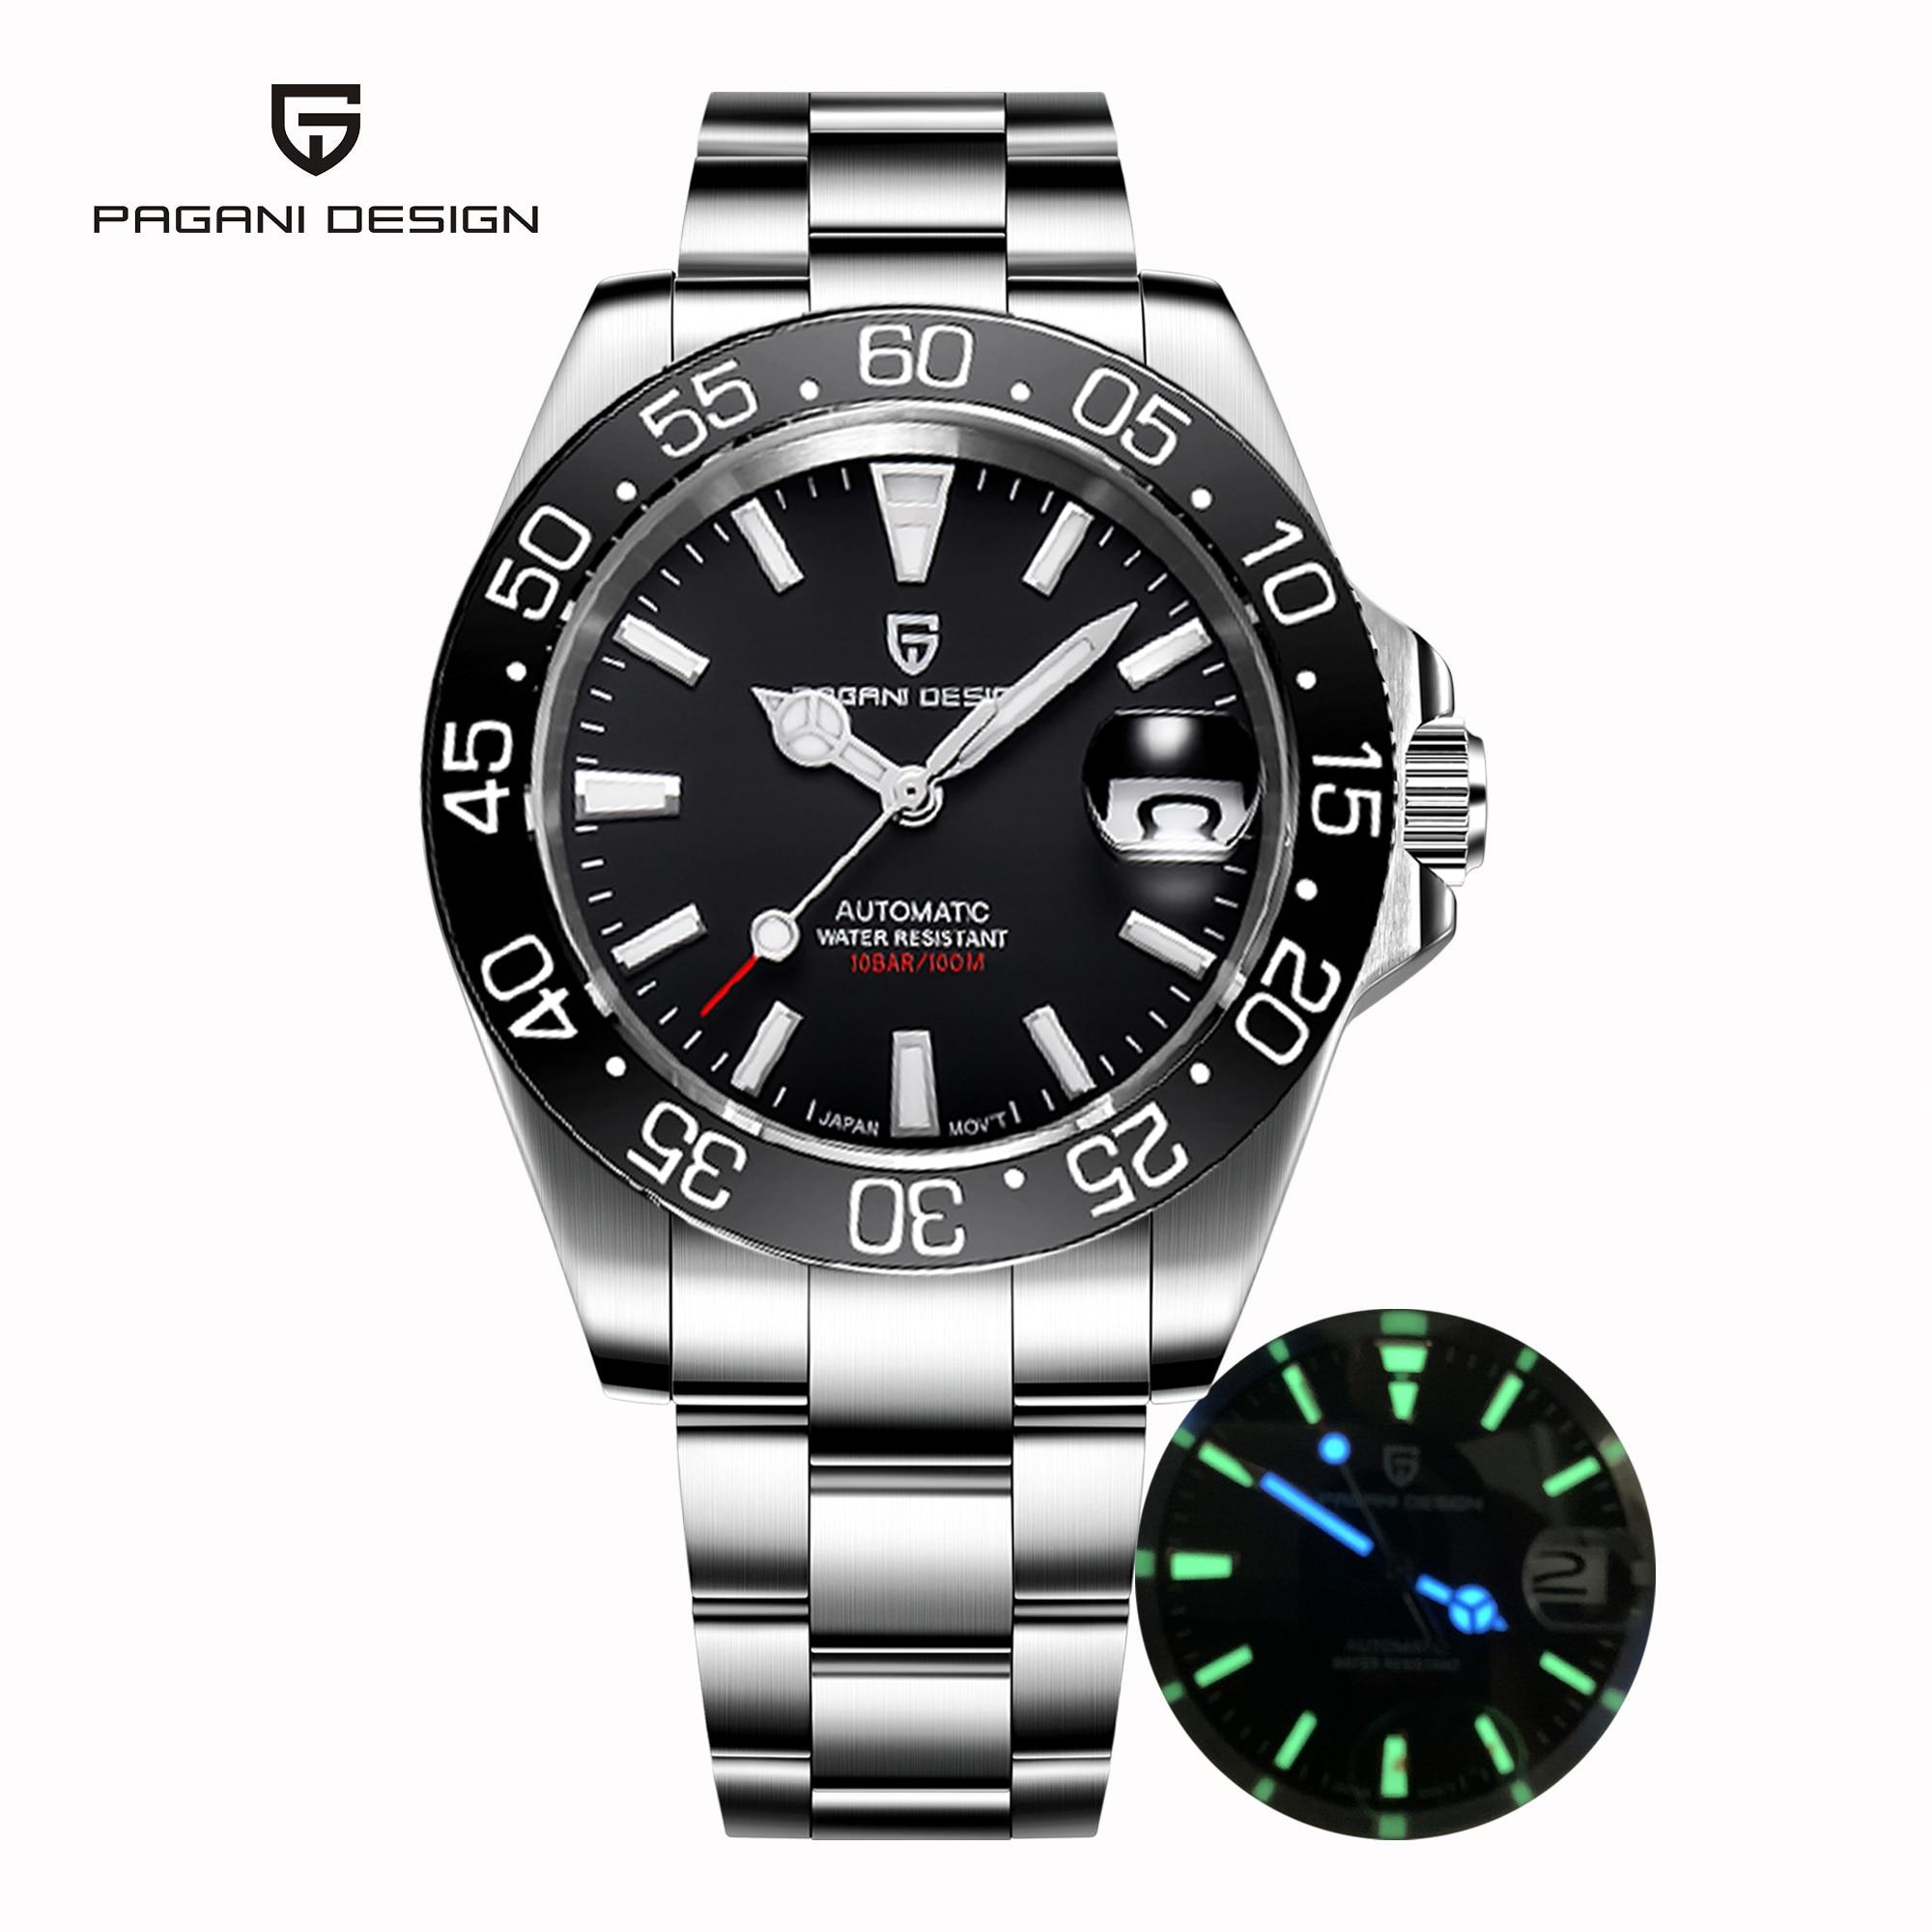 PAGANI Design-ساعة رجالية ، أوتوماتيكية ، ميكانيكية ، رياضية ، 10 بار ، مقاومة للماء ، ياباني ، NH35 ، 2020